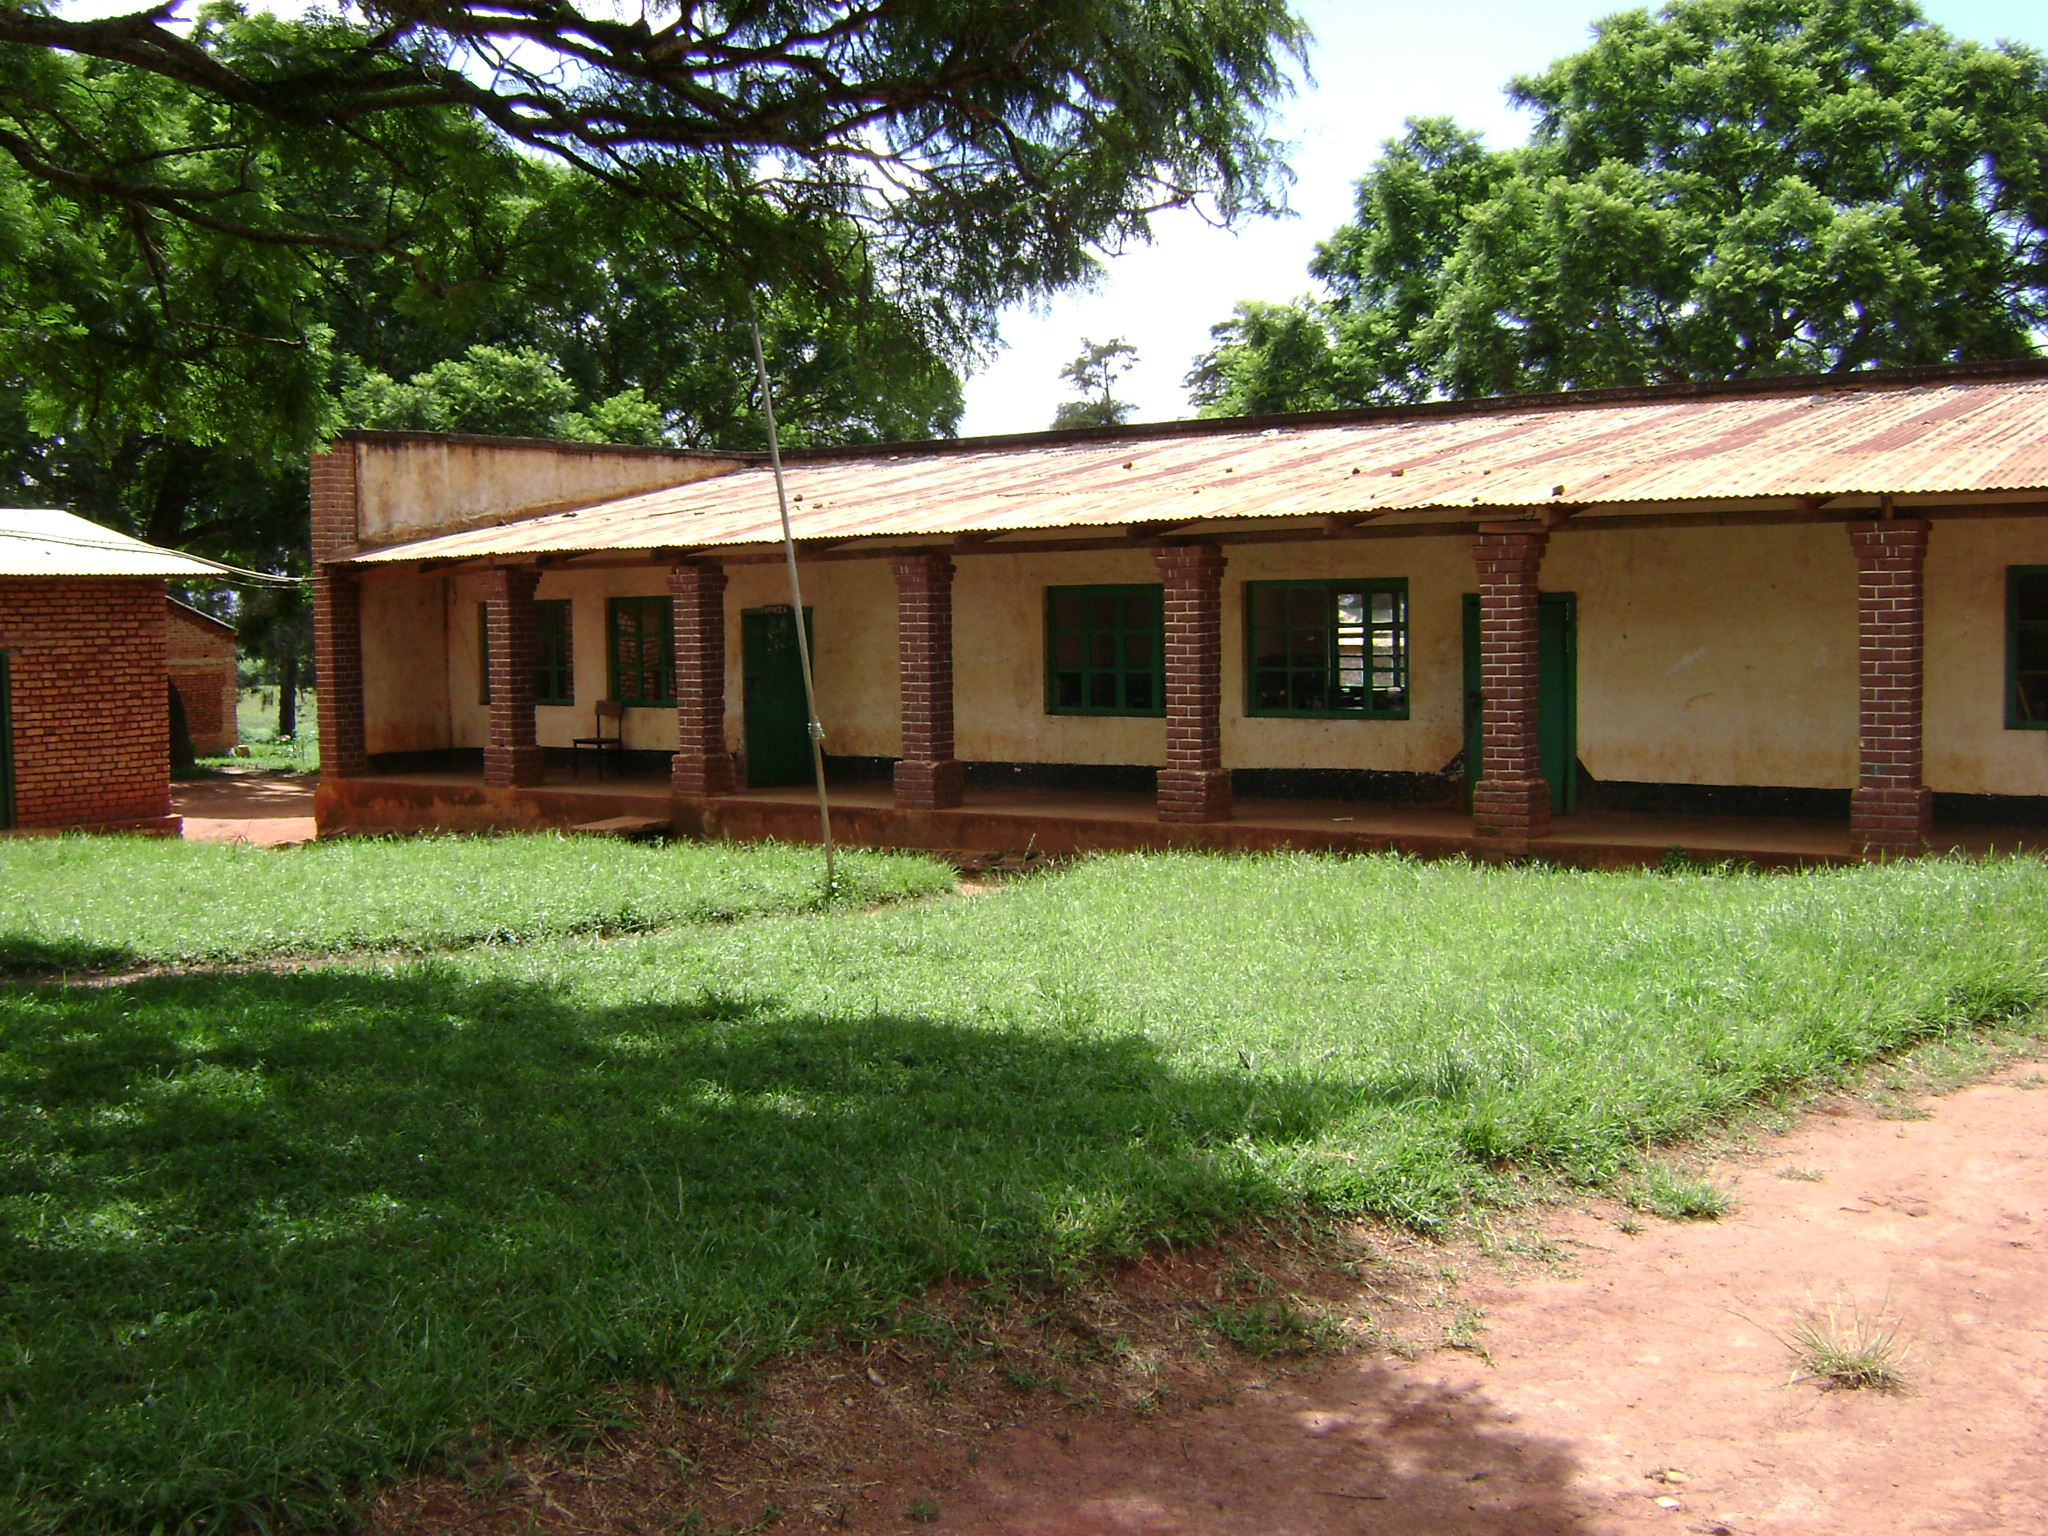 School classroom building